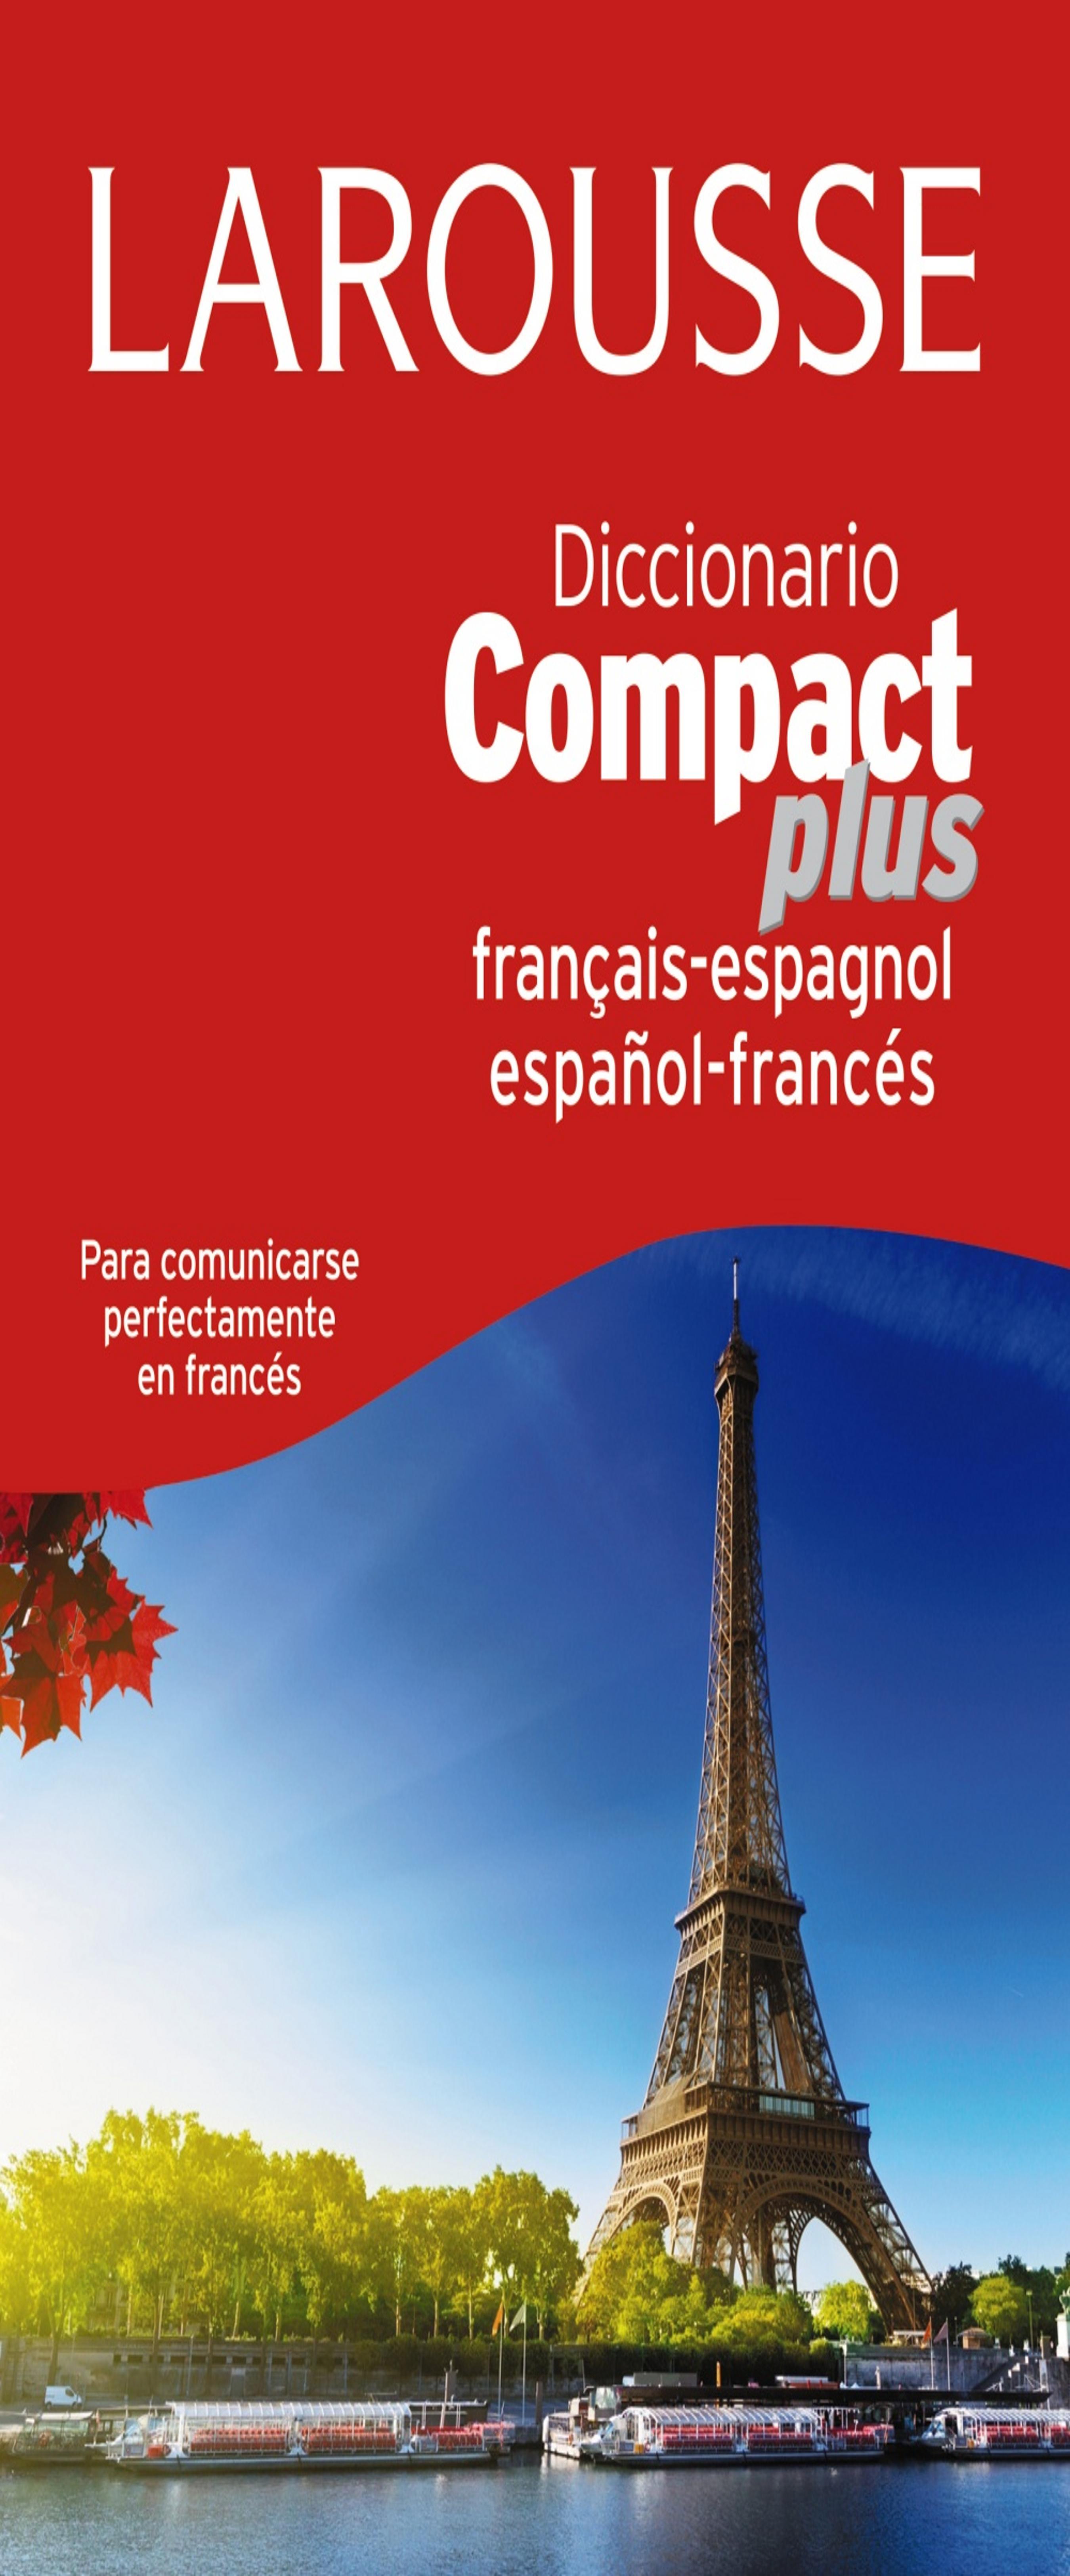 DICC Larousse COMPACT PLUS Francés - Esp / Esp - Francés